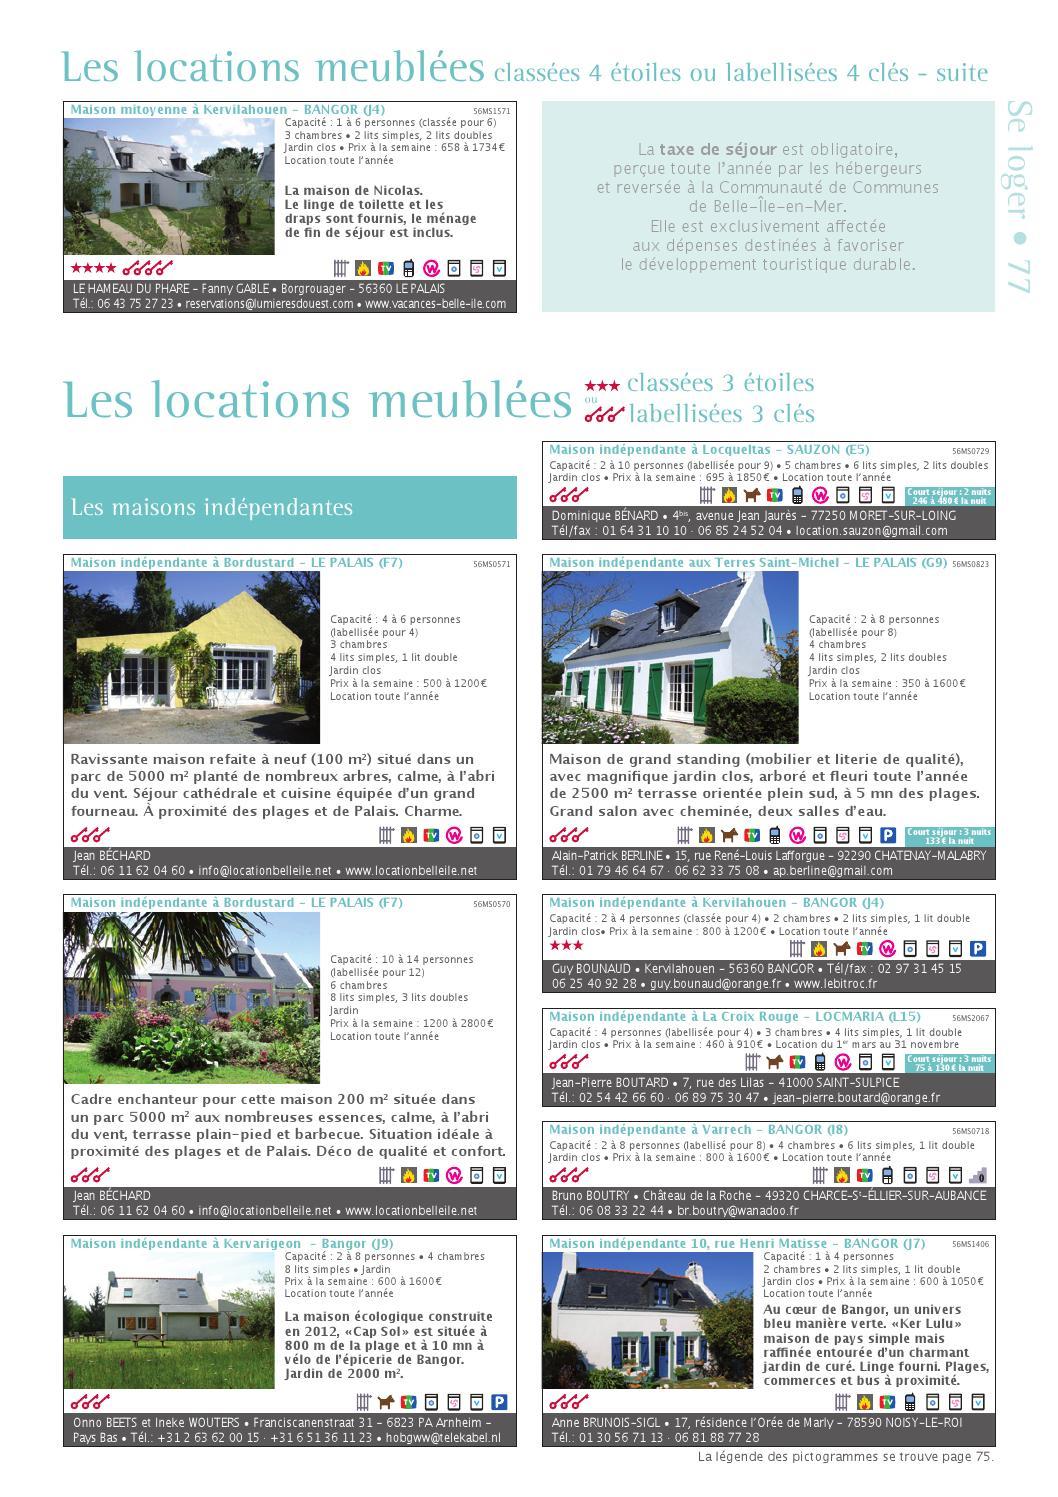 Gsd 2014 By Ot Belle Ile - Issuu intérieur Prix Location Jardin